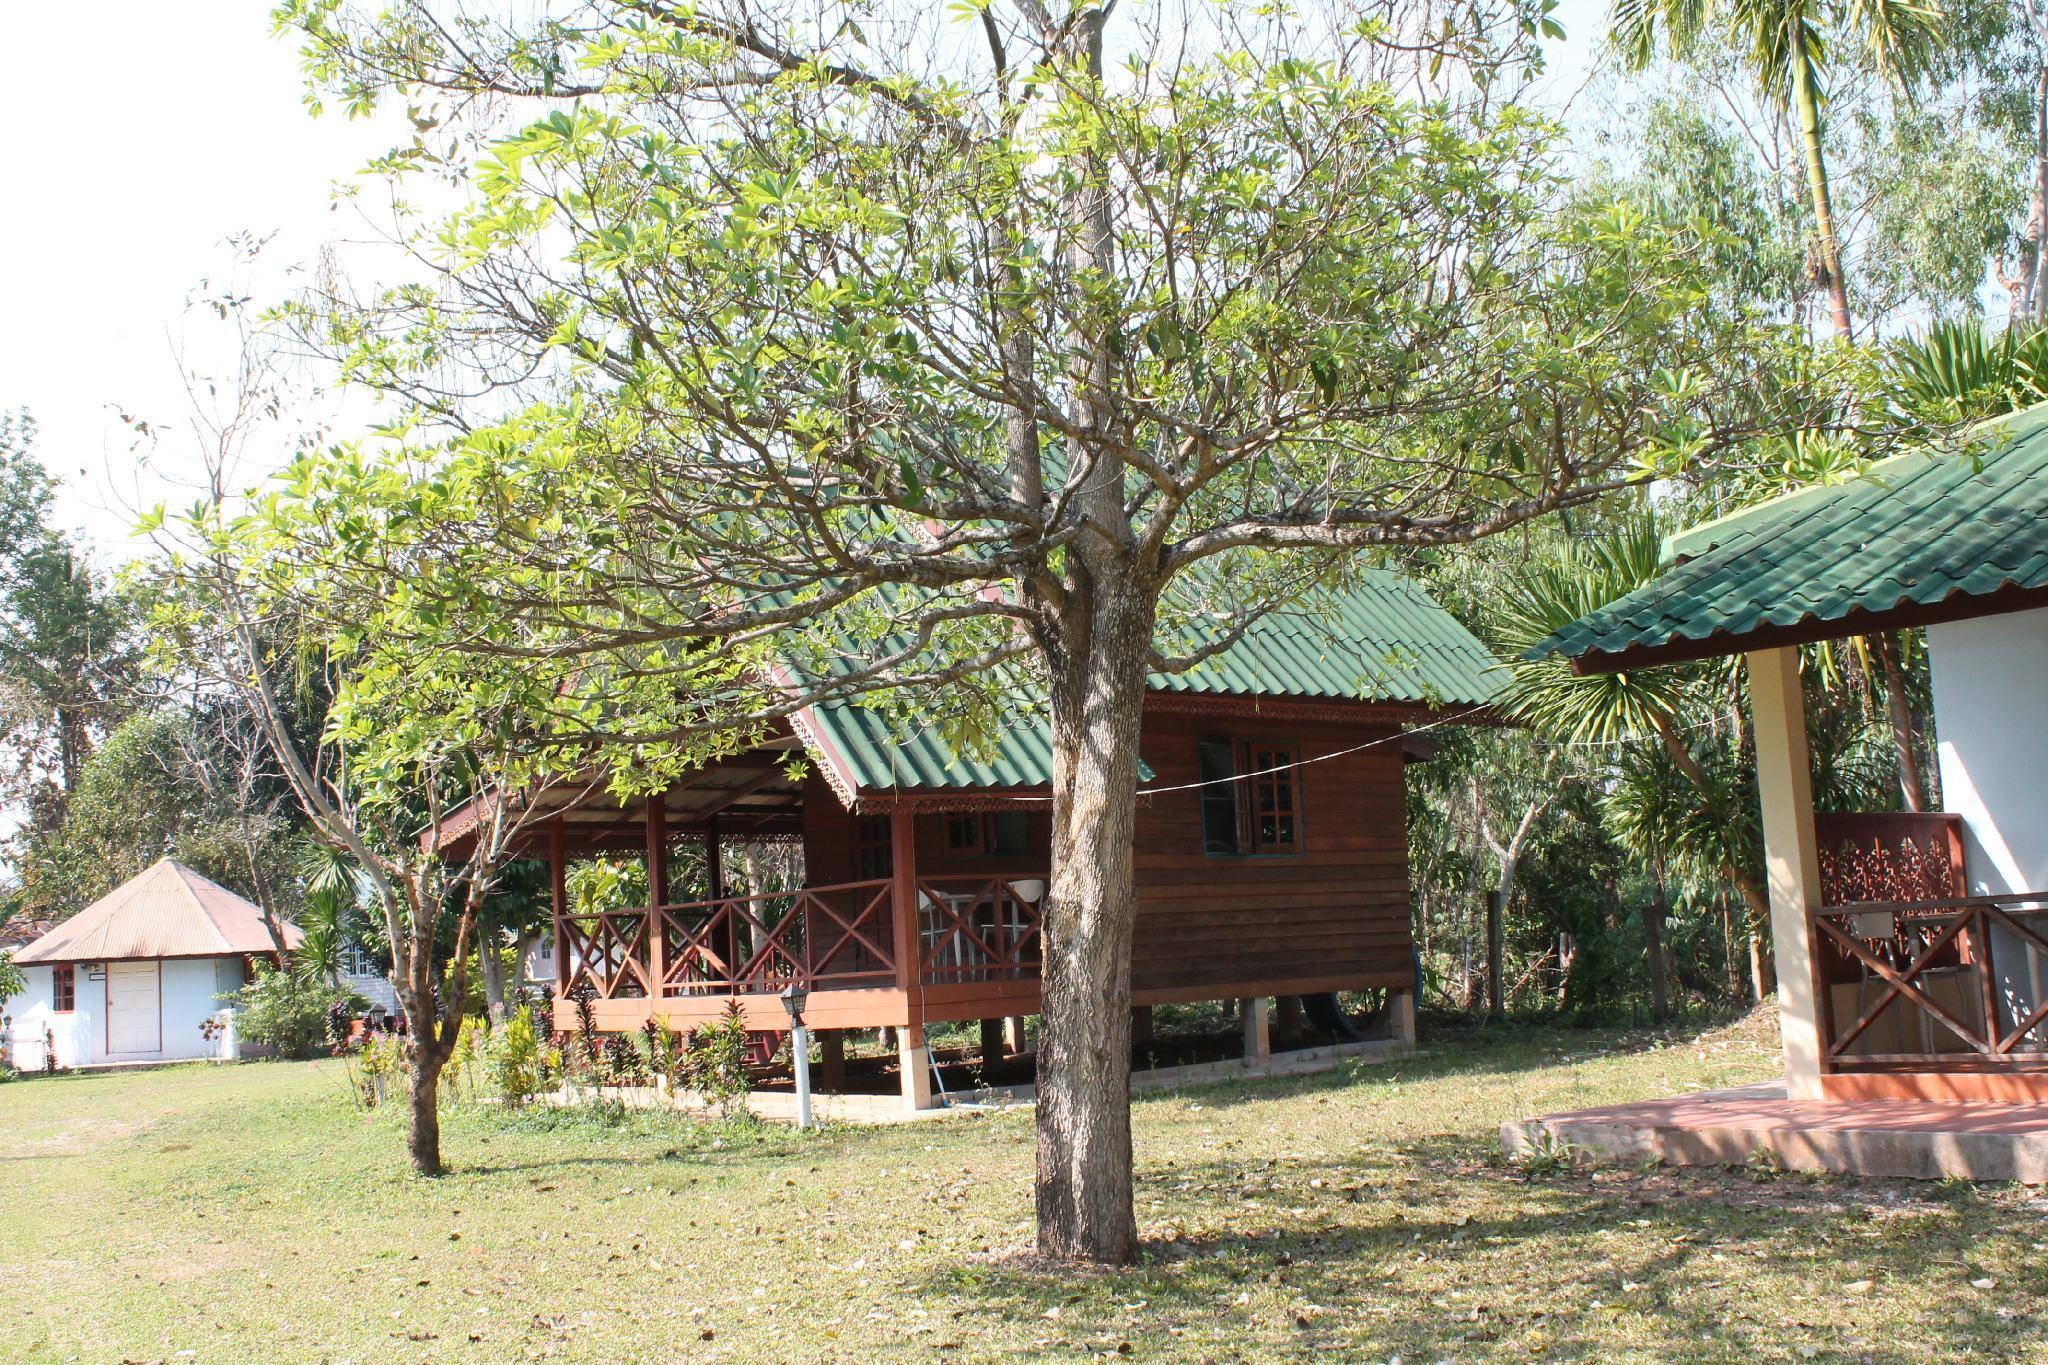 Kanyaporn Resort @ Phu-Ruea กัญญาพร รีสอร์ต แอท ภูเรือ